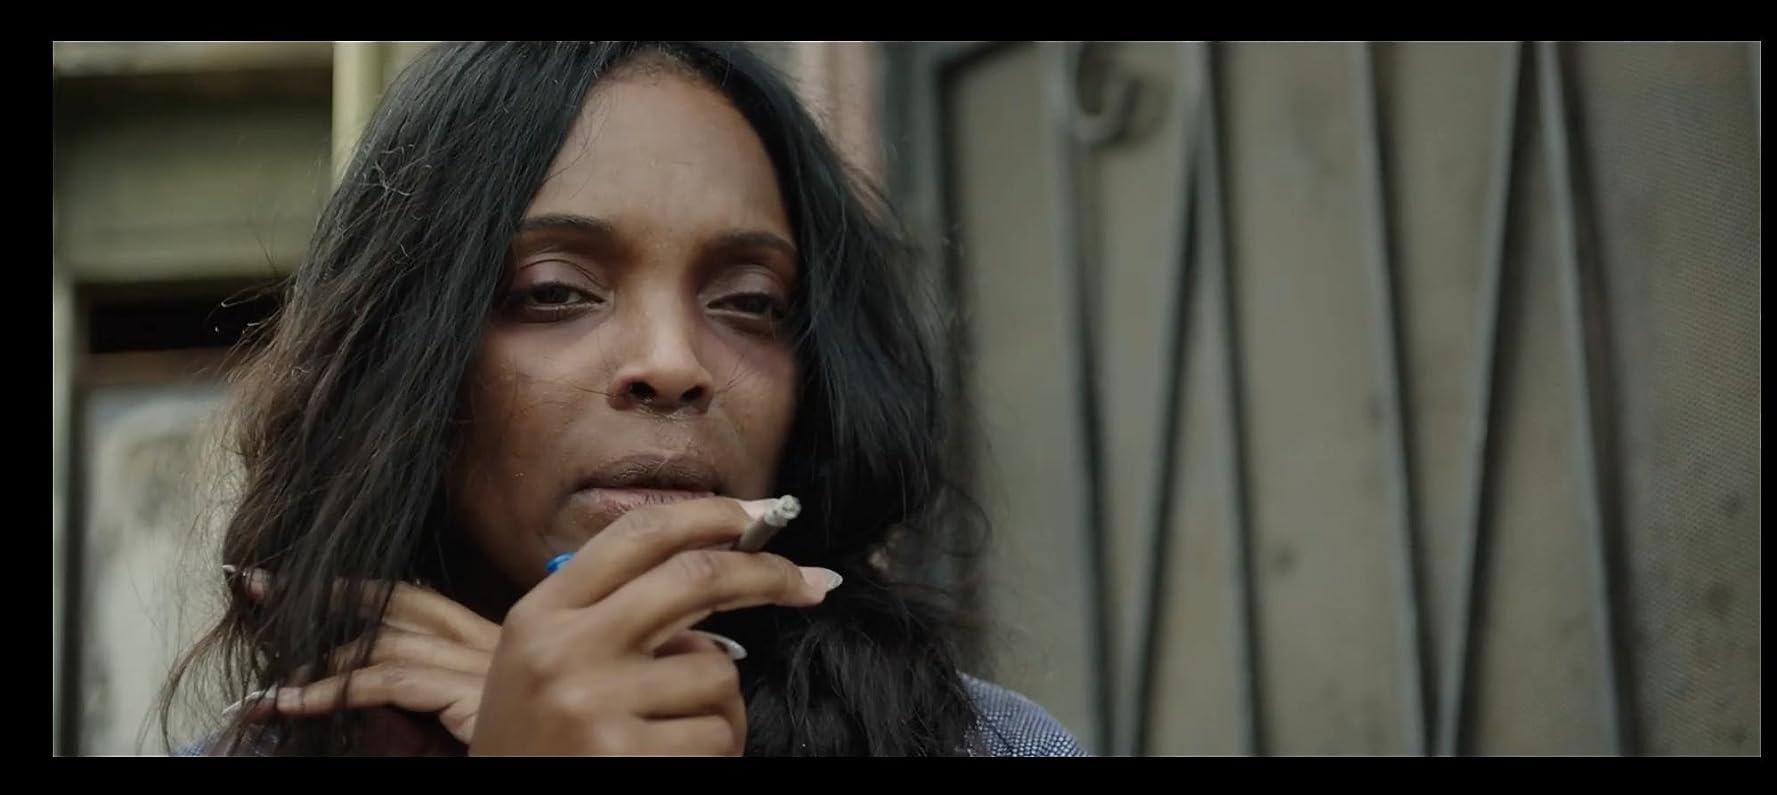 Watch Francesca D'Aloja video